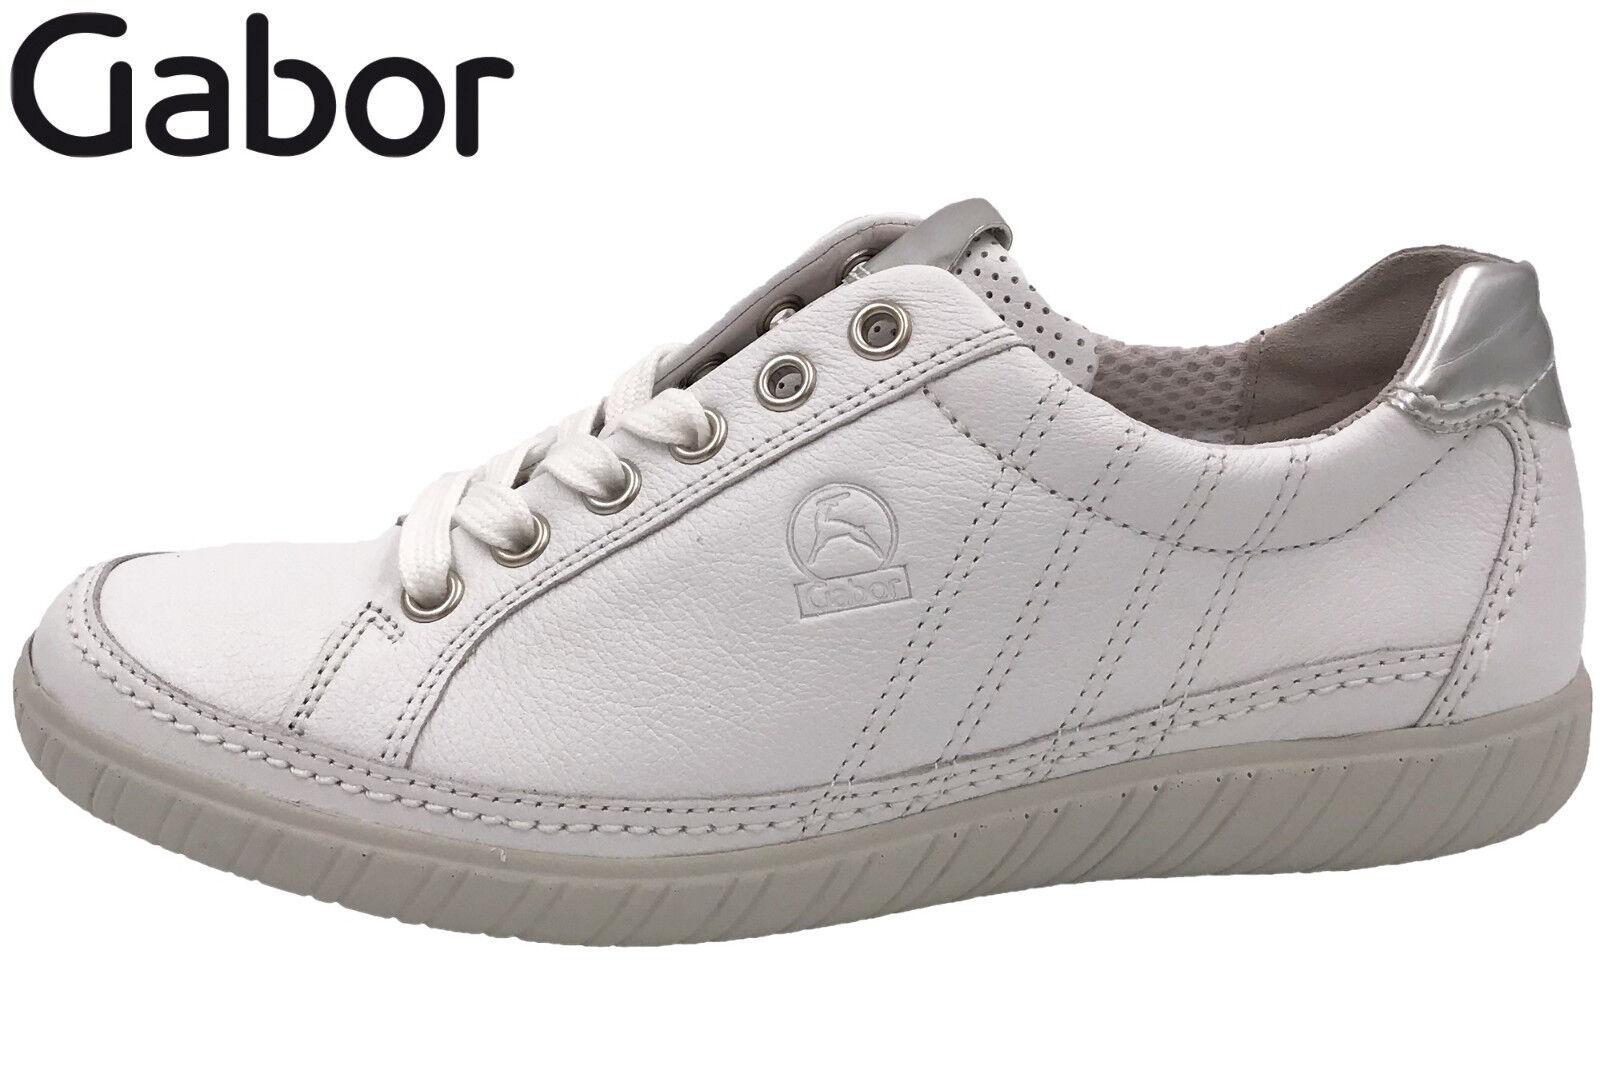 Gabor Comfort Damen Schuhe Sneaker Weiß Leder Weite G Wechselfußbett 86.458.50